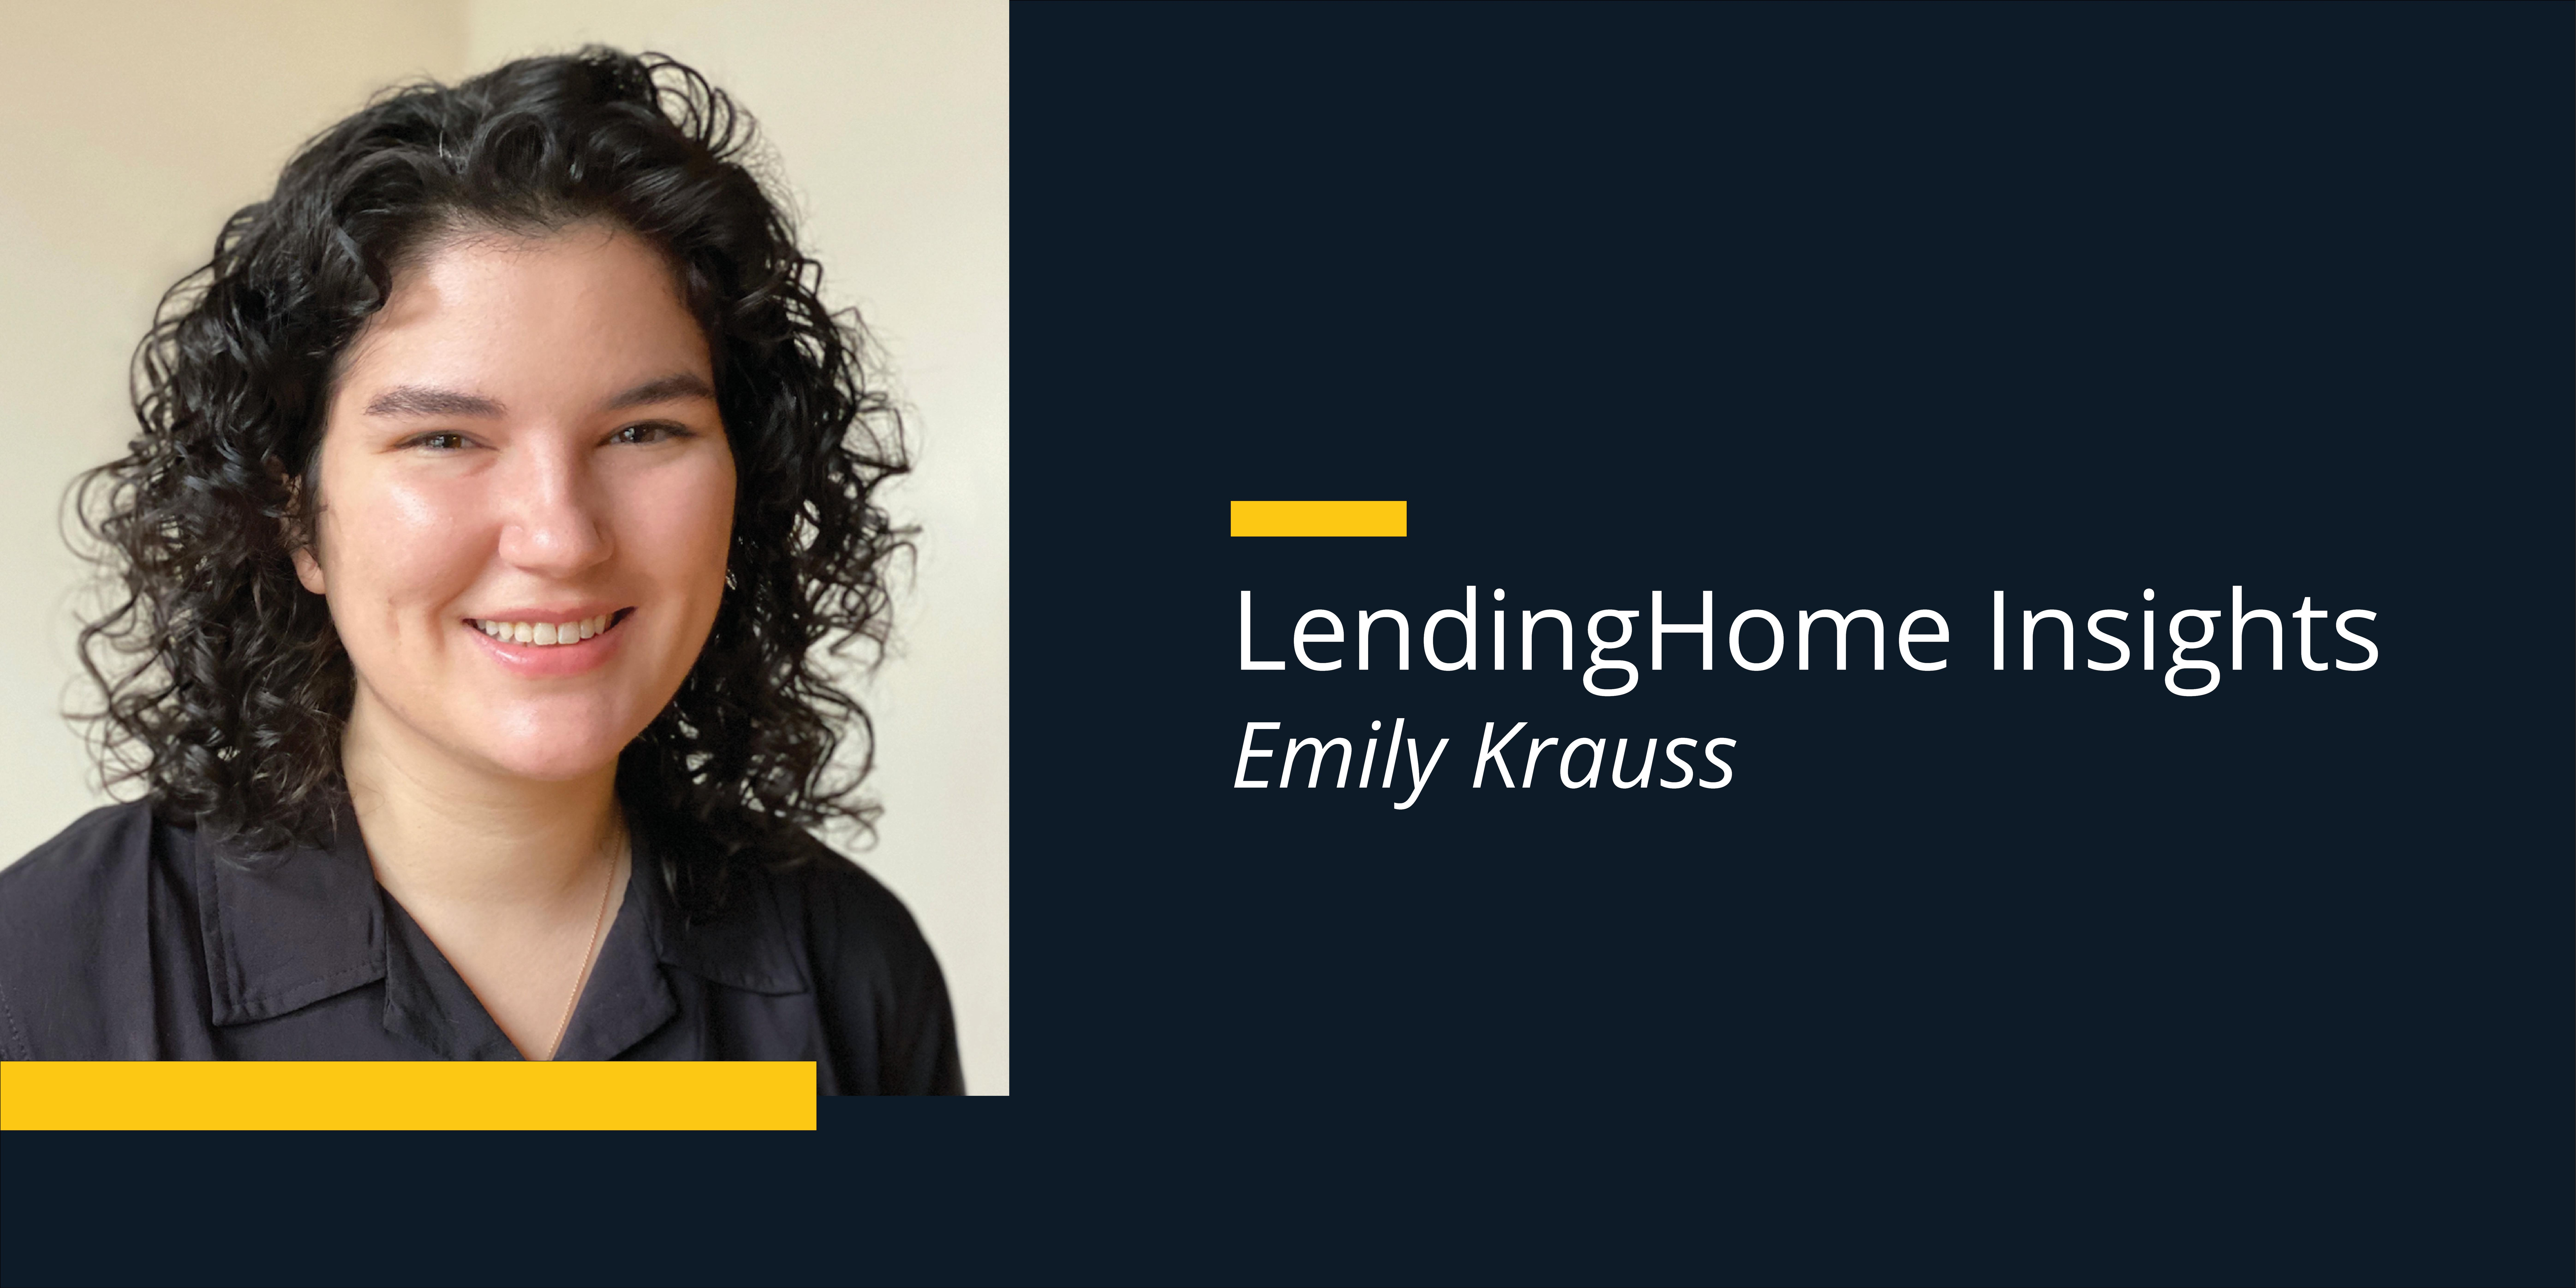 Employee Highlights: Emily Krauss | LendingHome